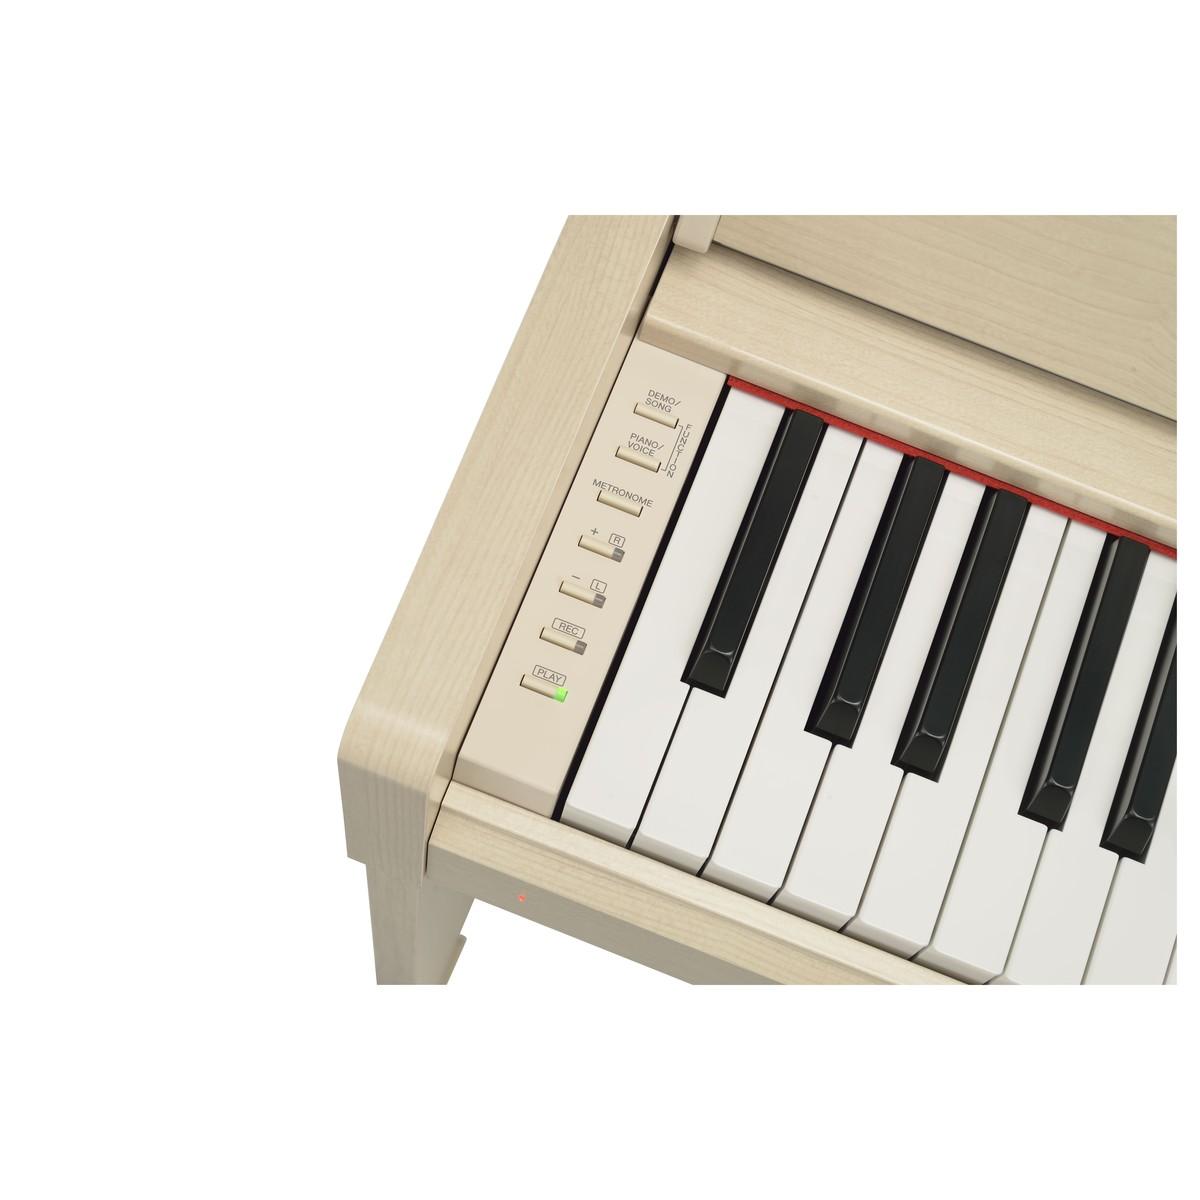 YAMAHA ARIUS YDP-S34 WA PIANOFORTE DIGITALE 88 TASTI PESATI COLORE BIANCO CENERE 5